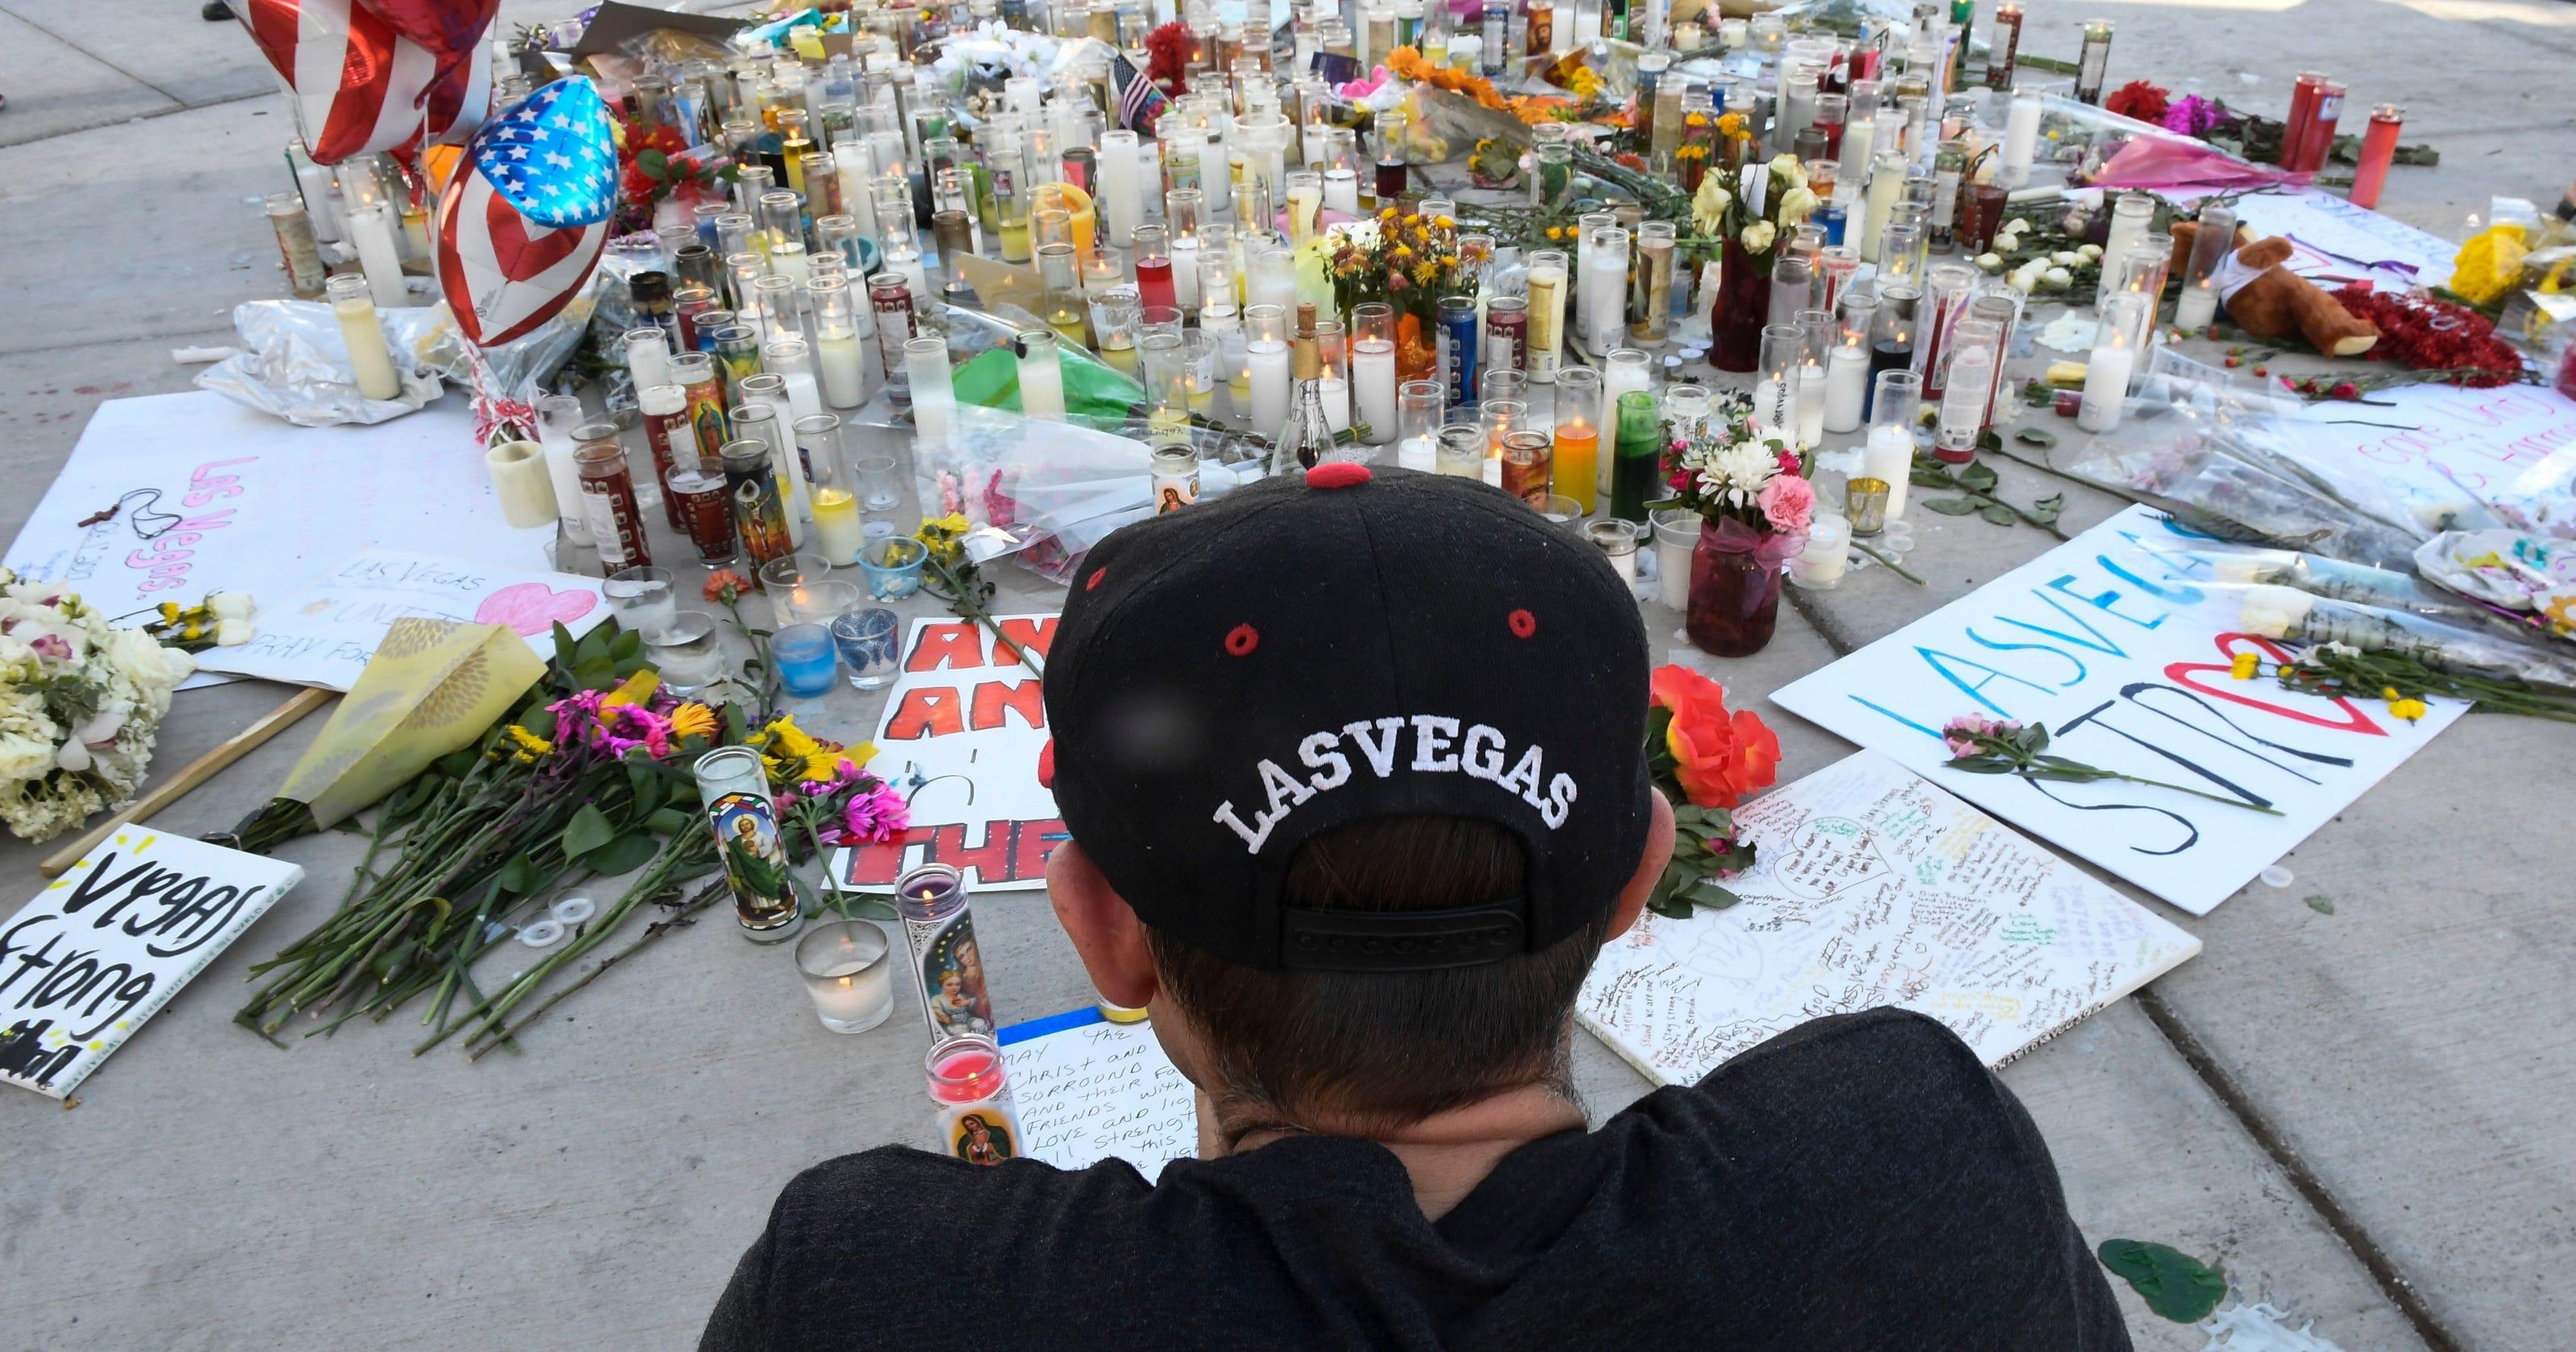 066c82b0554 Las Vegas shooting  Full victim list